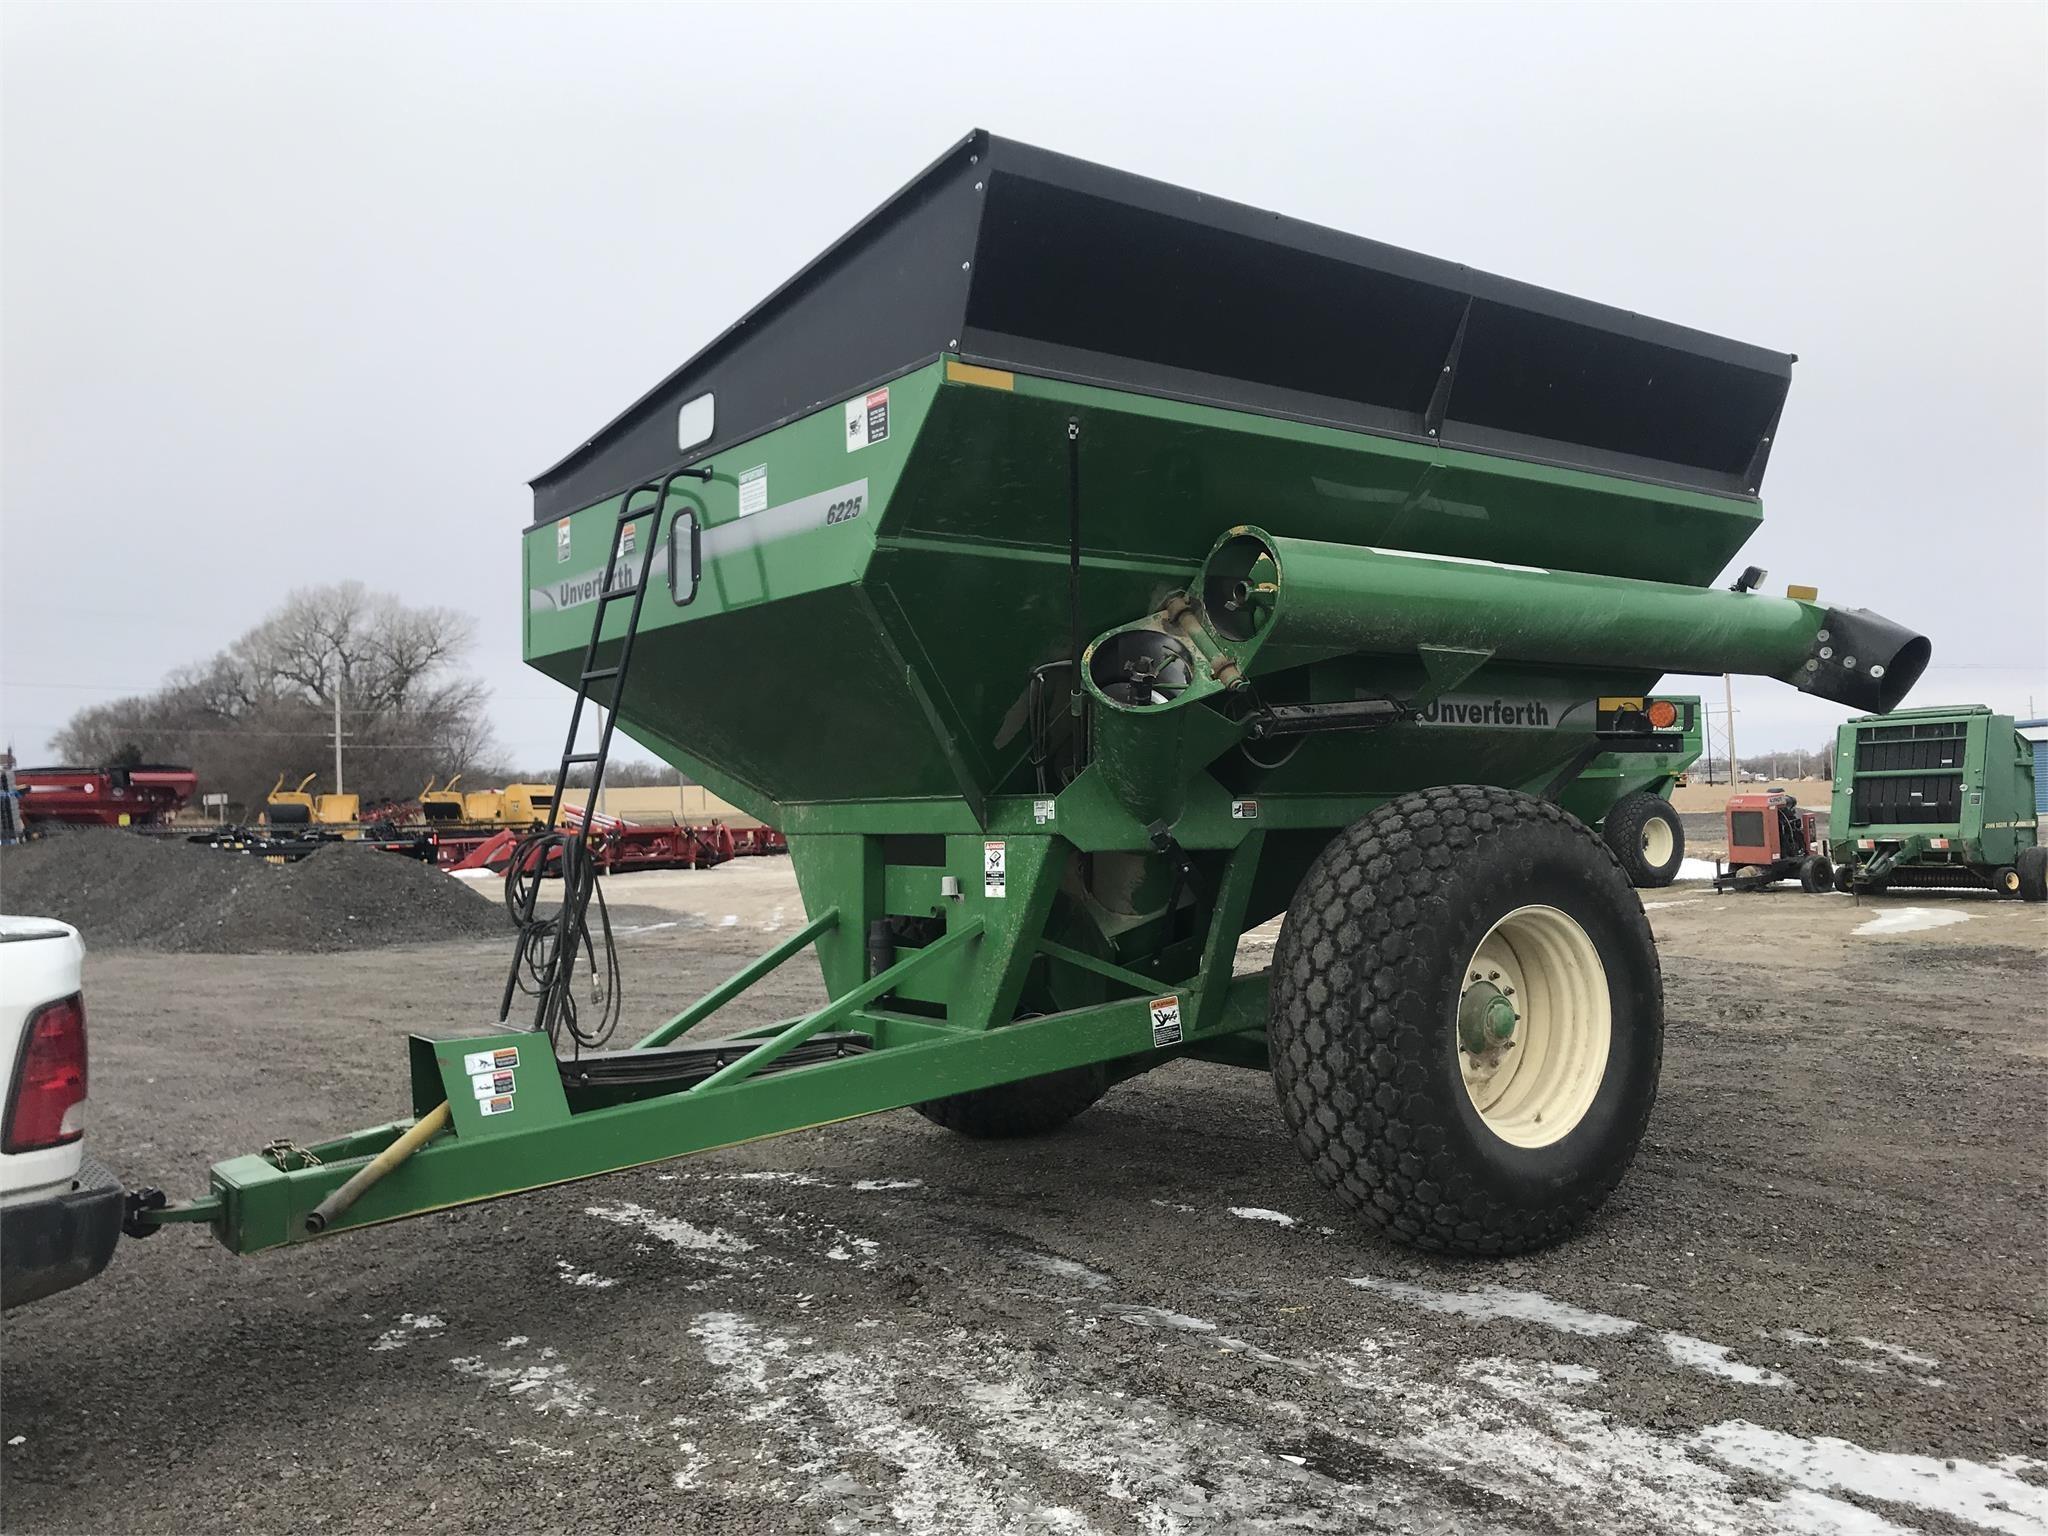 2013 Unverferth 6225 Grain Cart